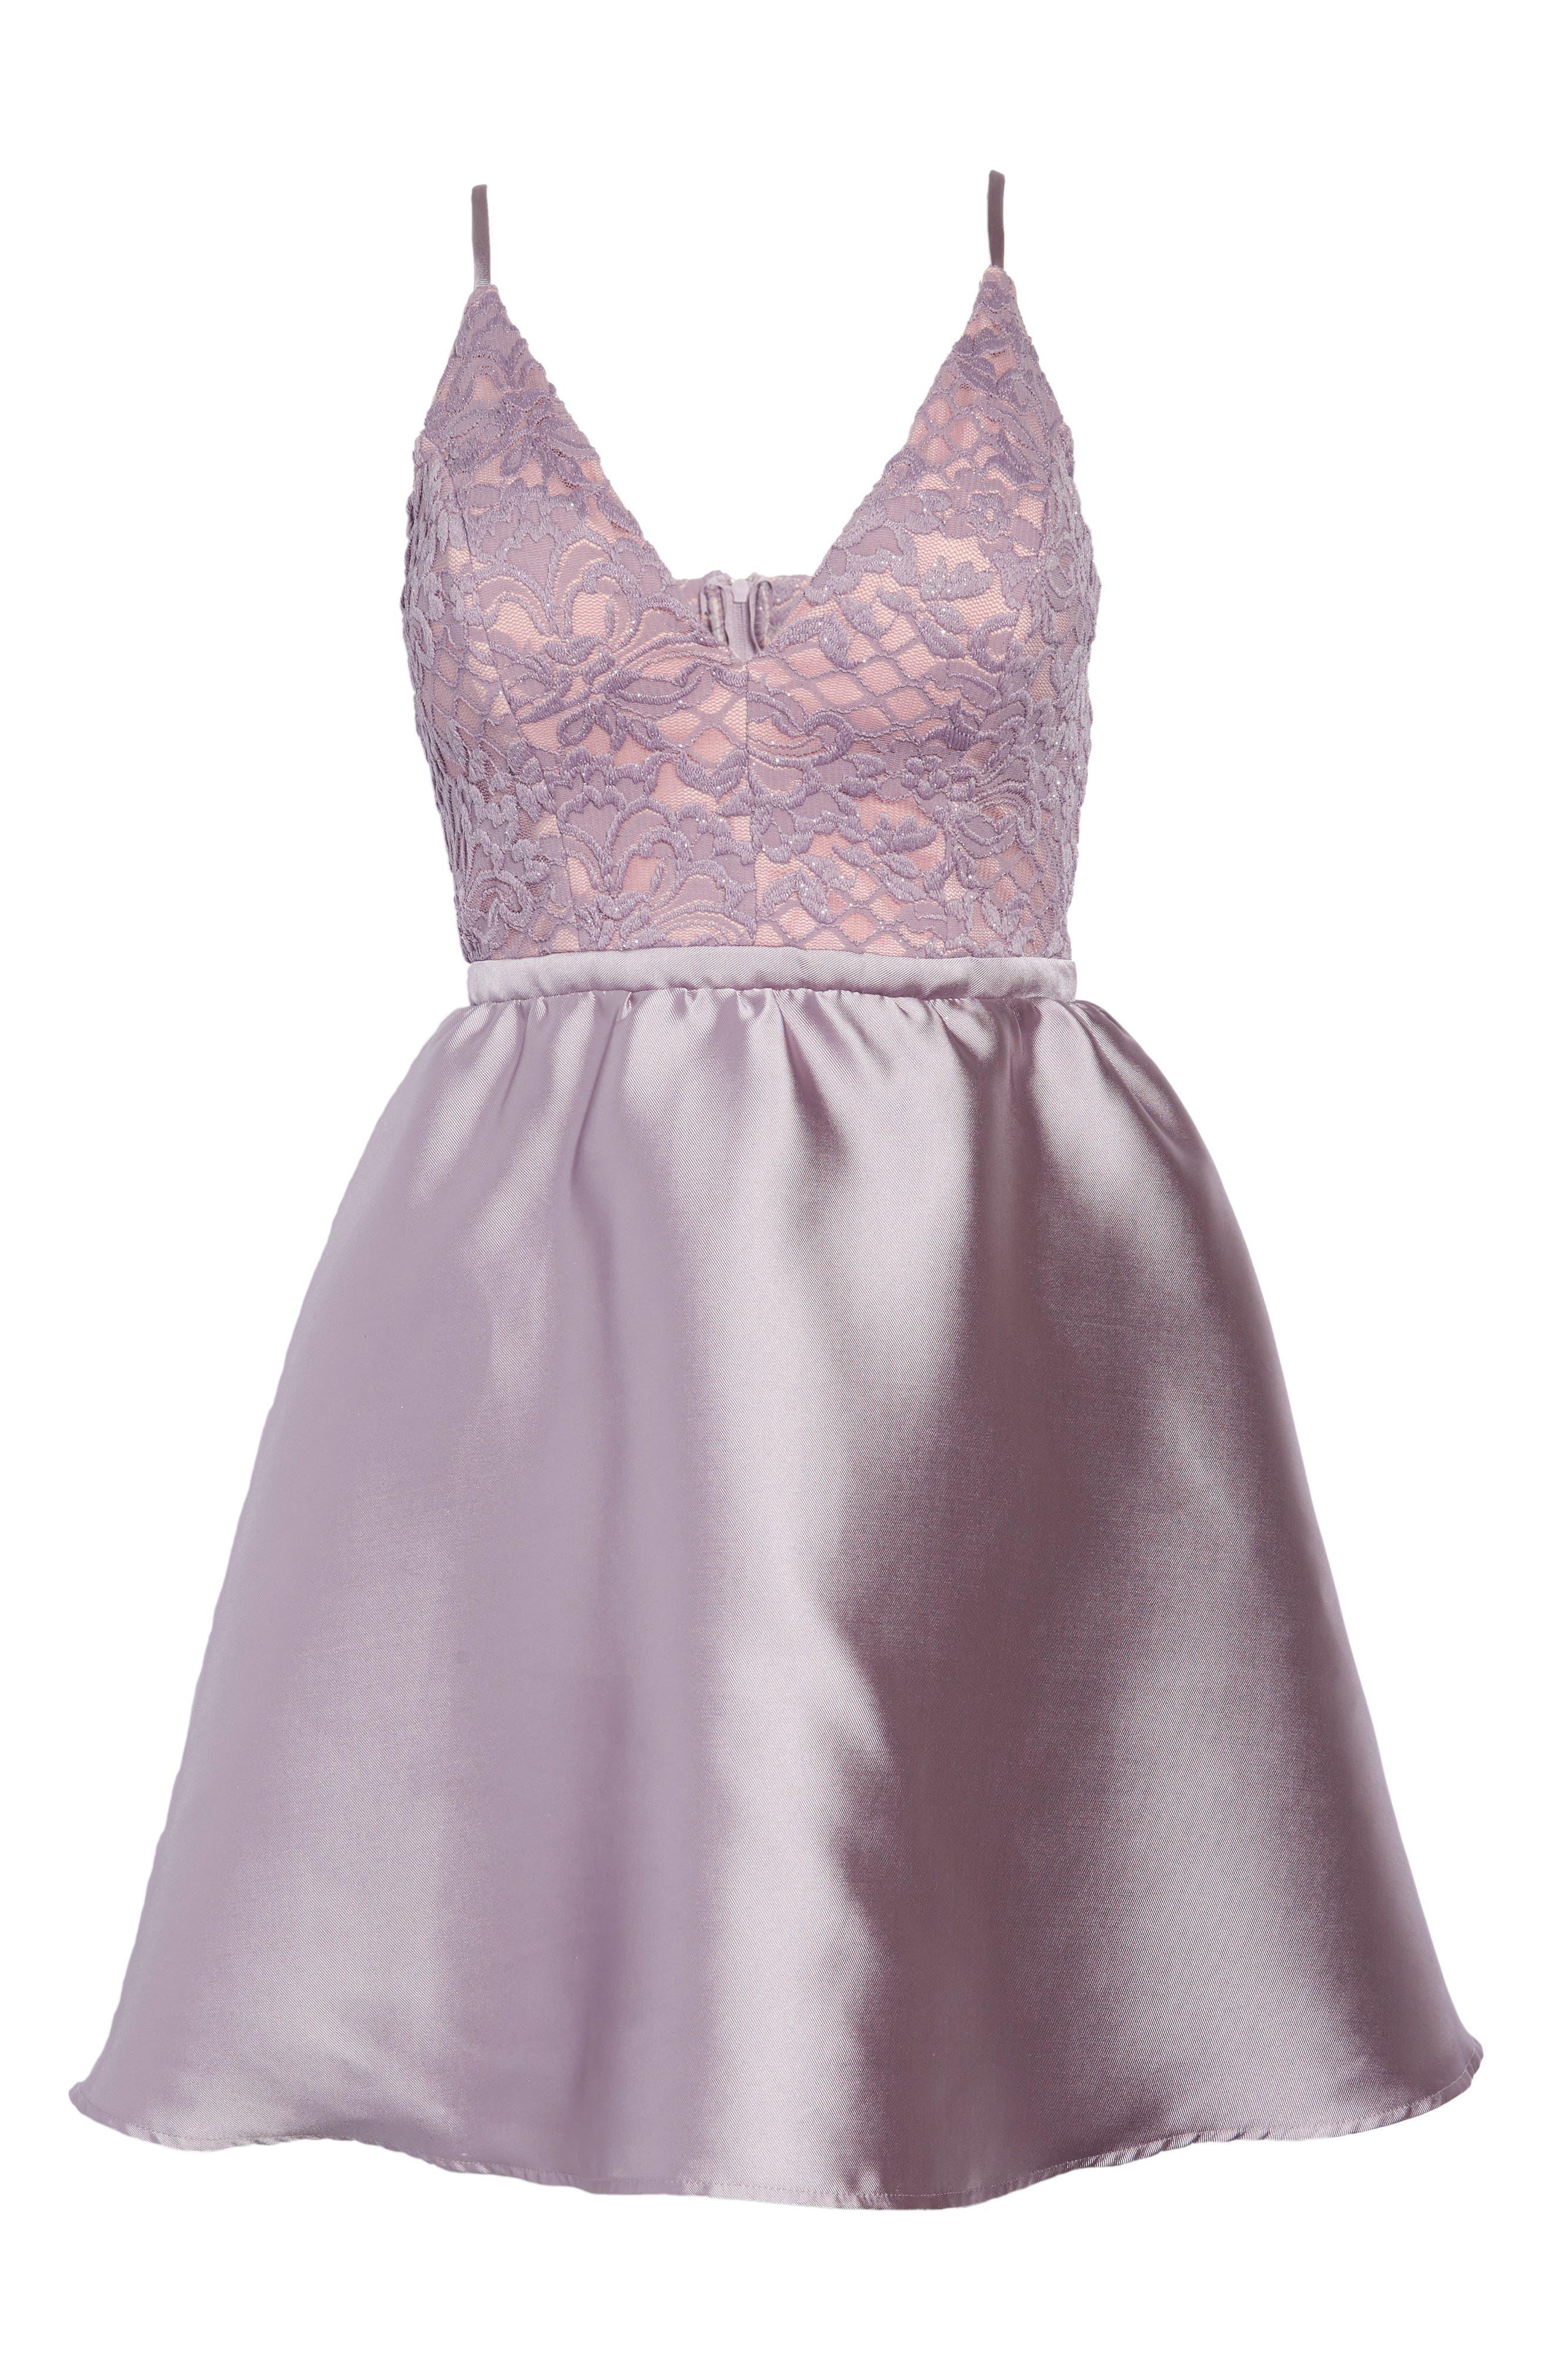 Lace & Taffeta Party Dress,                             Alternate thumbnail 7, color,                             MAUVE